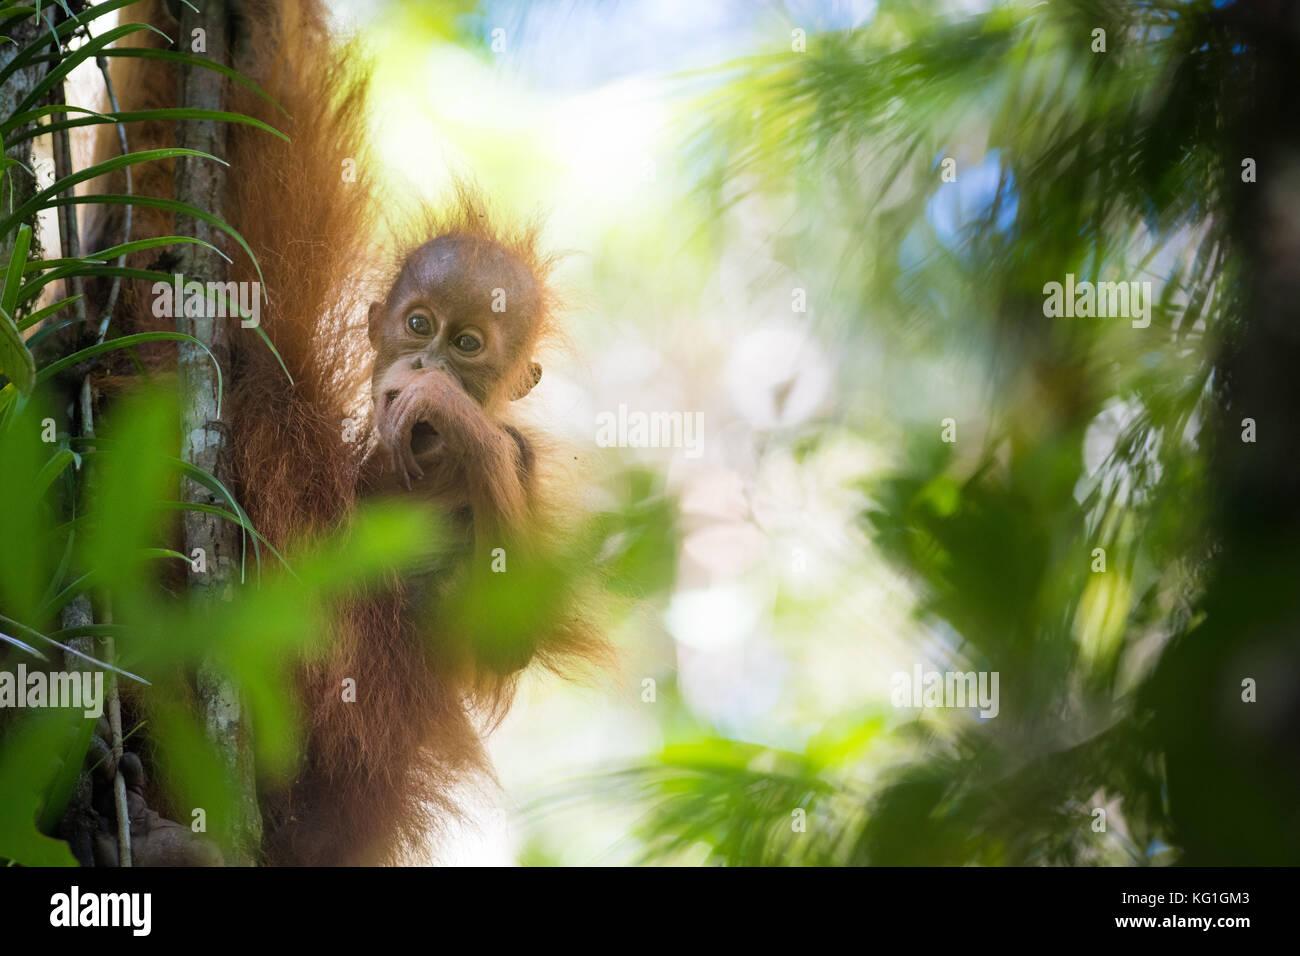 Beta, una femmina adulta Orango Tango con i suoi due anni di infantile, bitang. nuove specie orangutan scoperto Immagini Stock